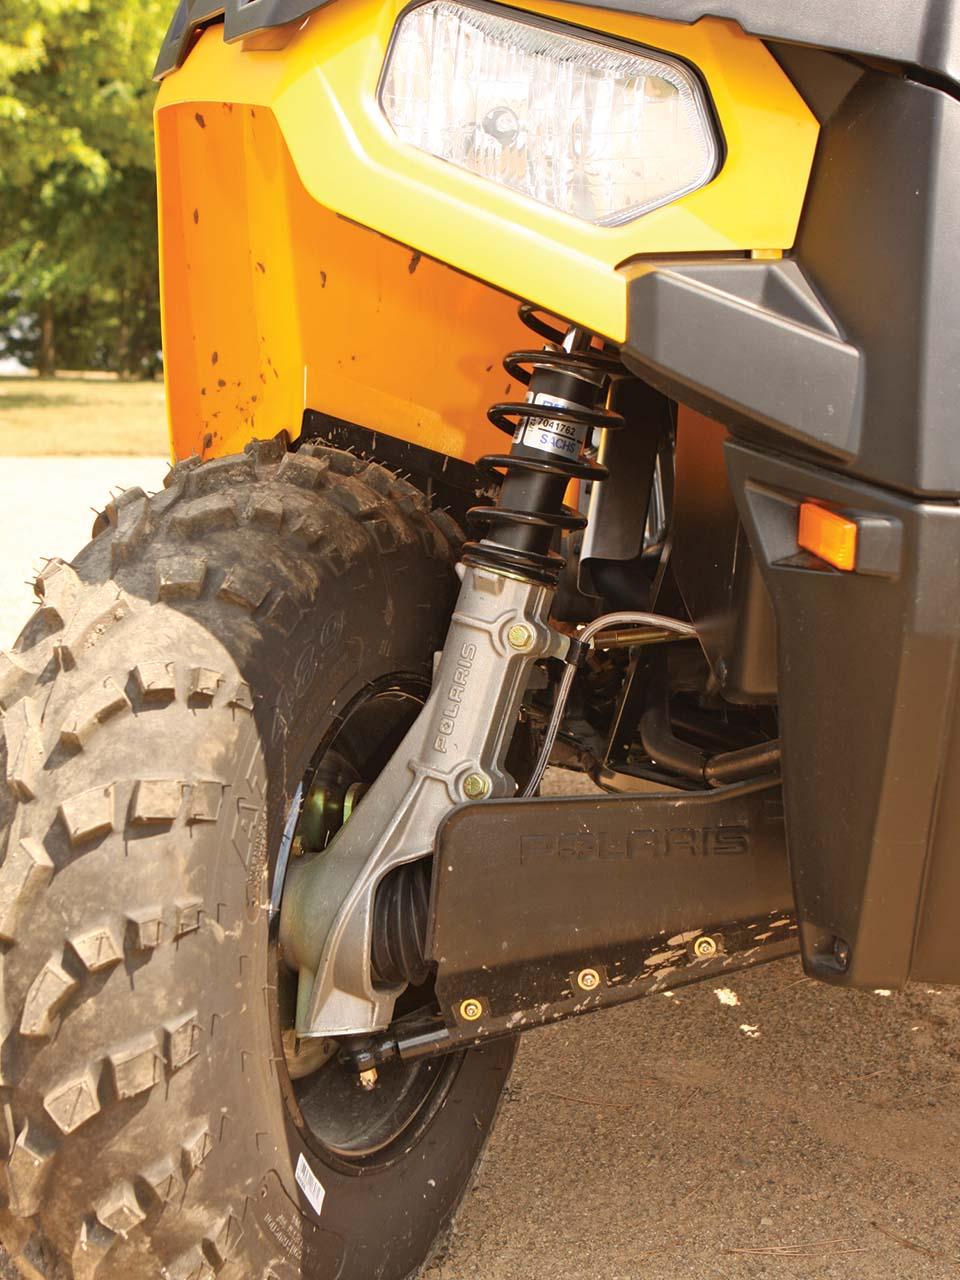 hight resolution of 2012 polaris sportsman500ho close up front suspension jpg